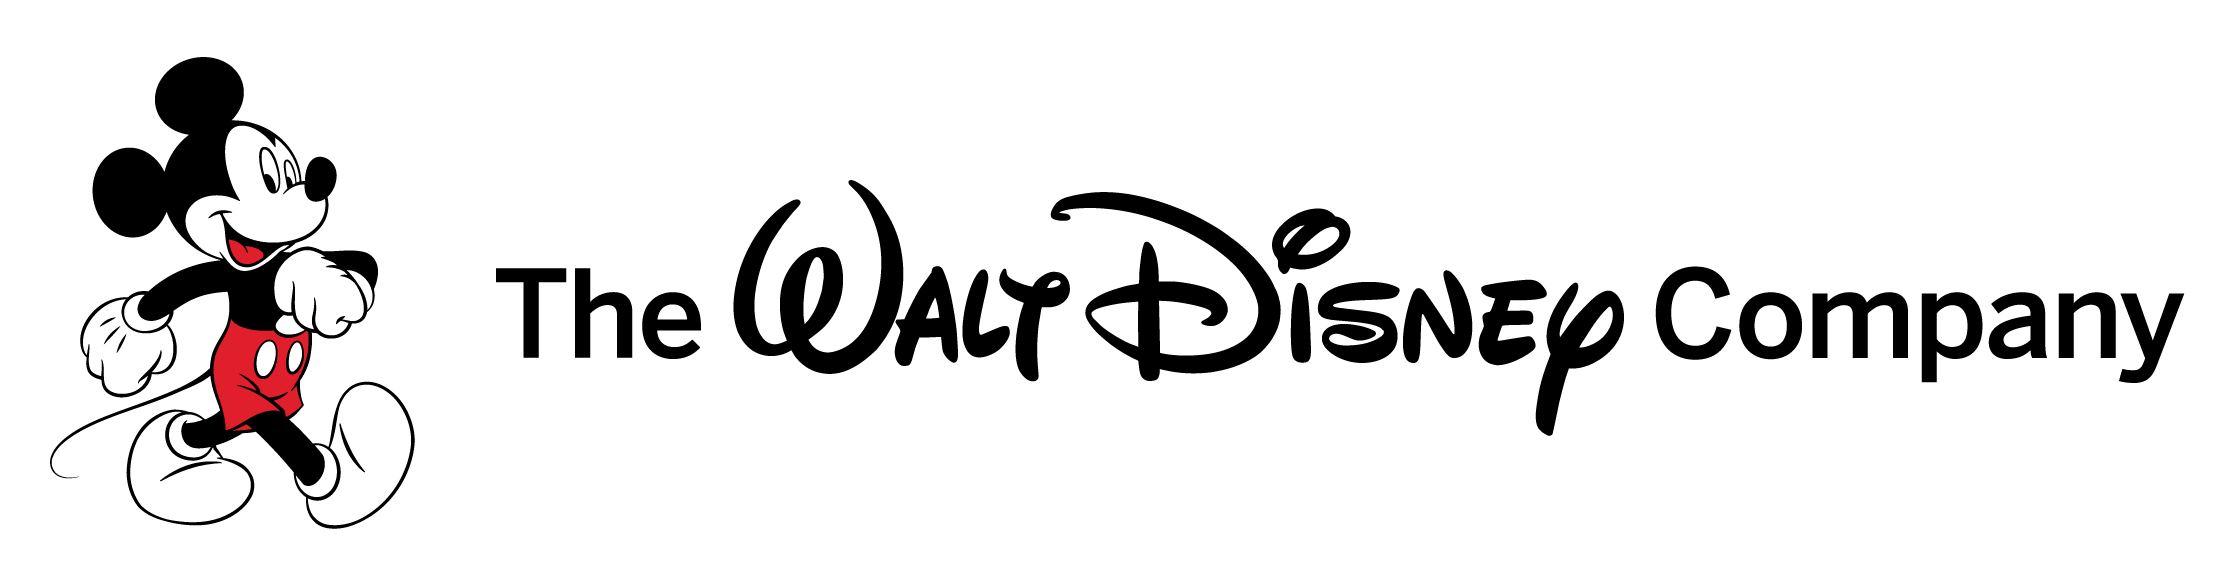 Walt%20Disney_logo.png